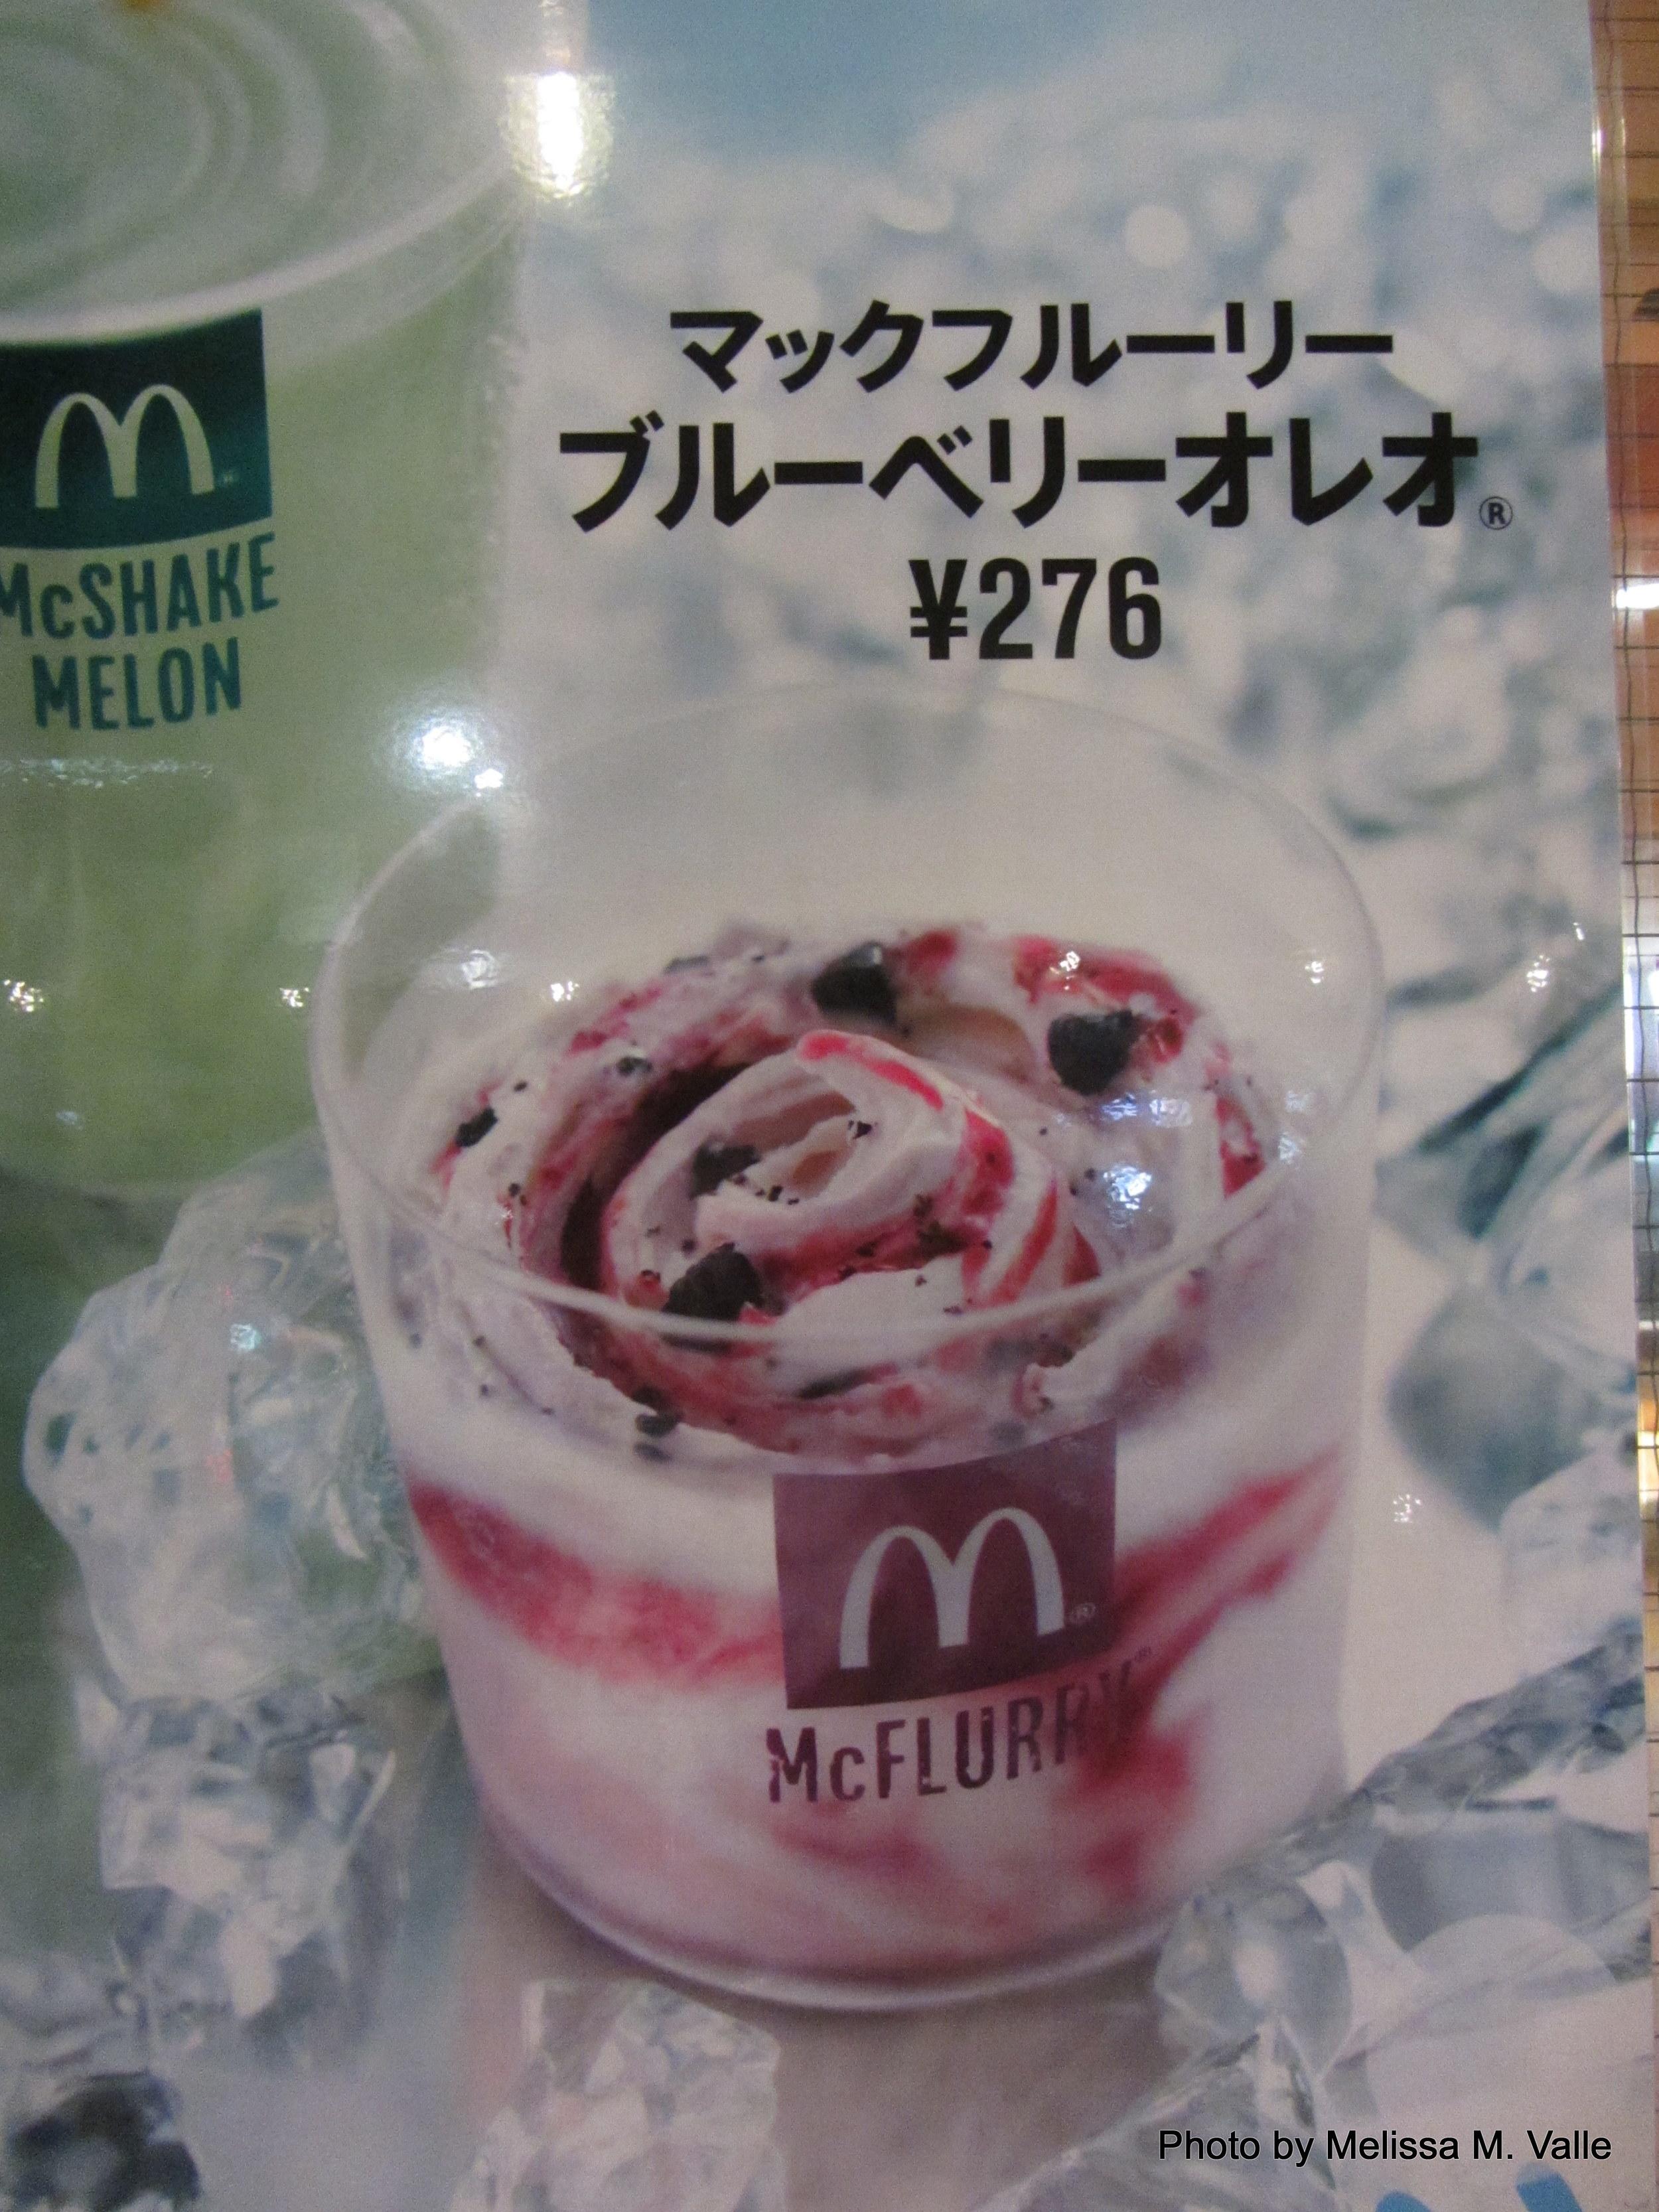 Obligatory McFlurry AbroadPic